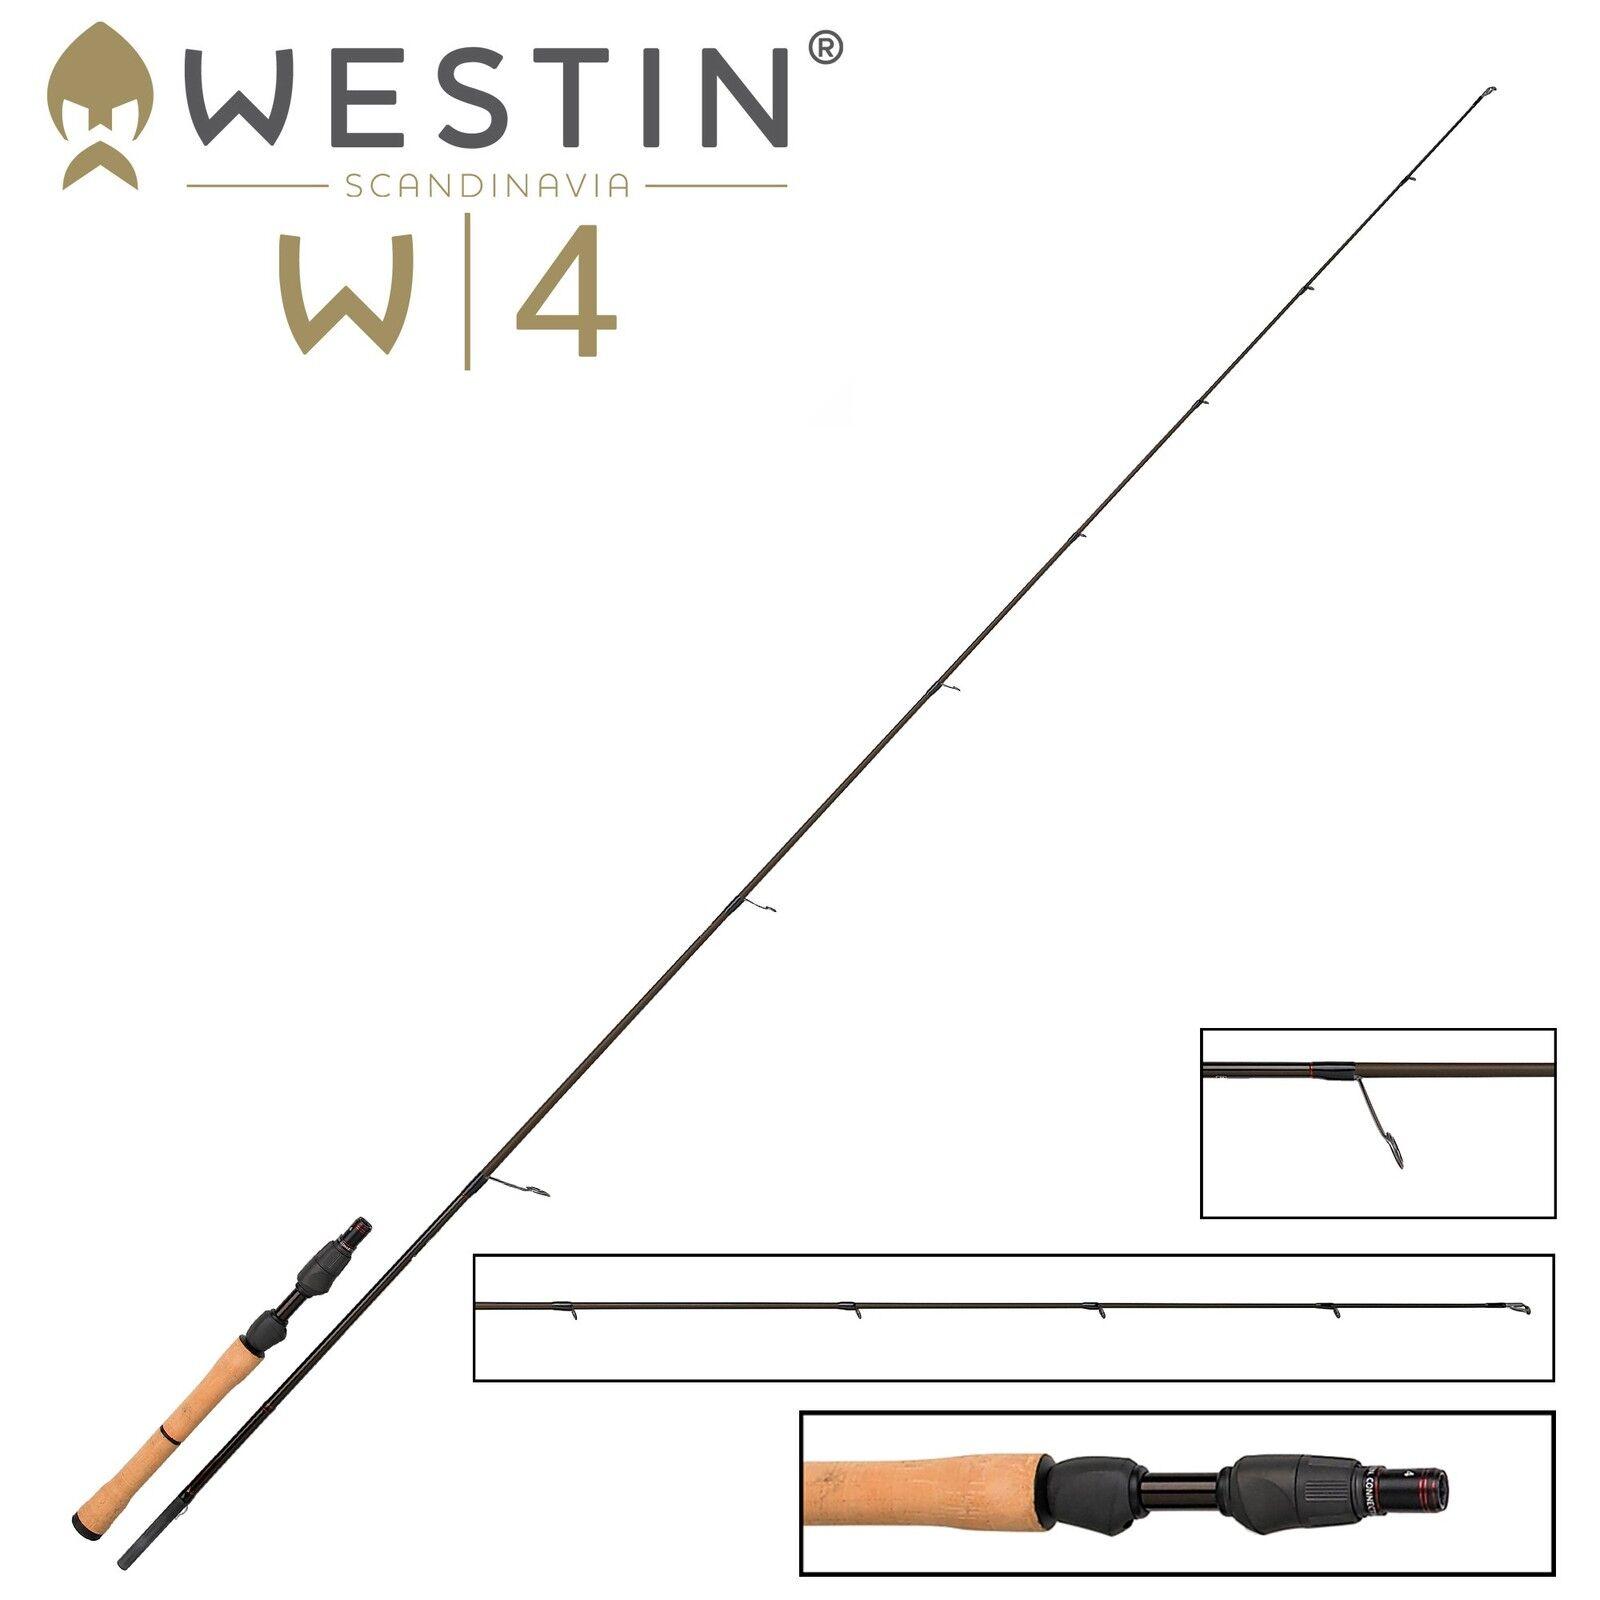 Westin W4 Vertical Jigging QL 185 cm Vertikalrute H 21-40g Vertikalrute cm zum Raubfischangeln 4f3882